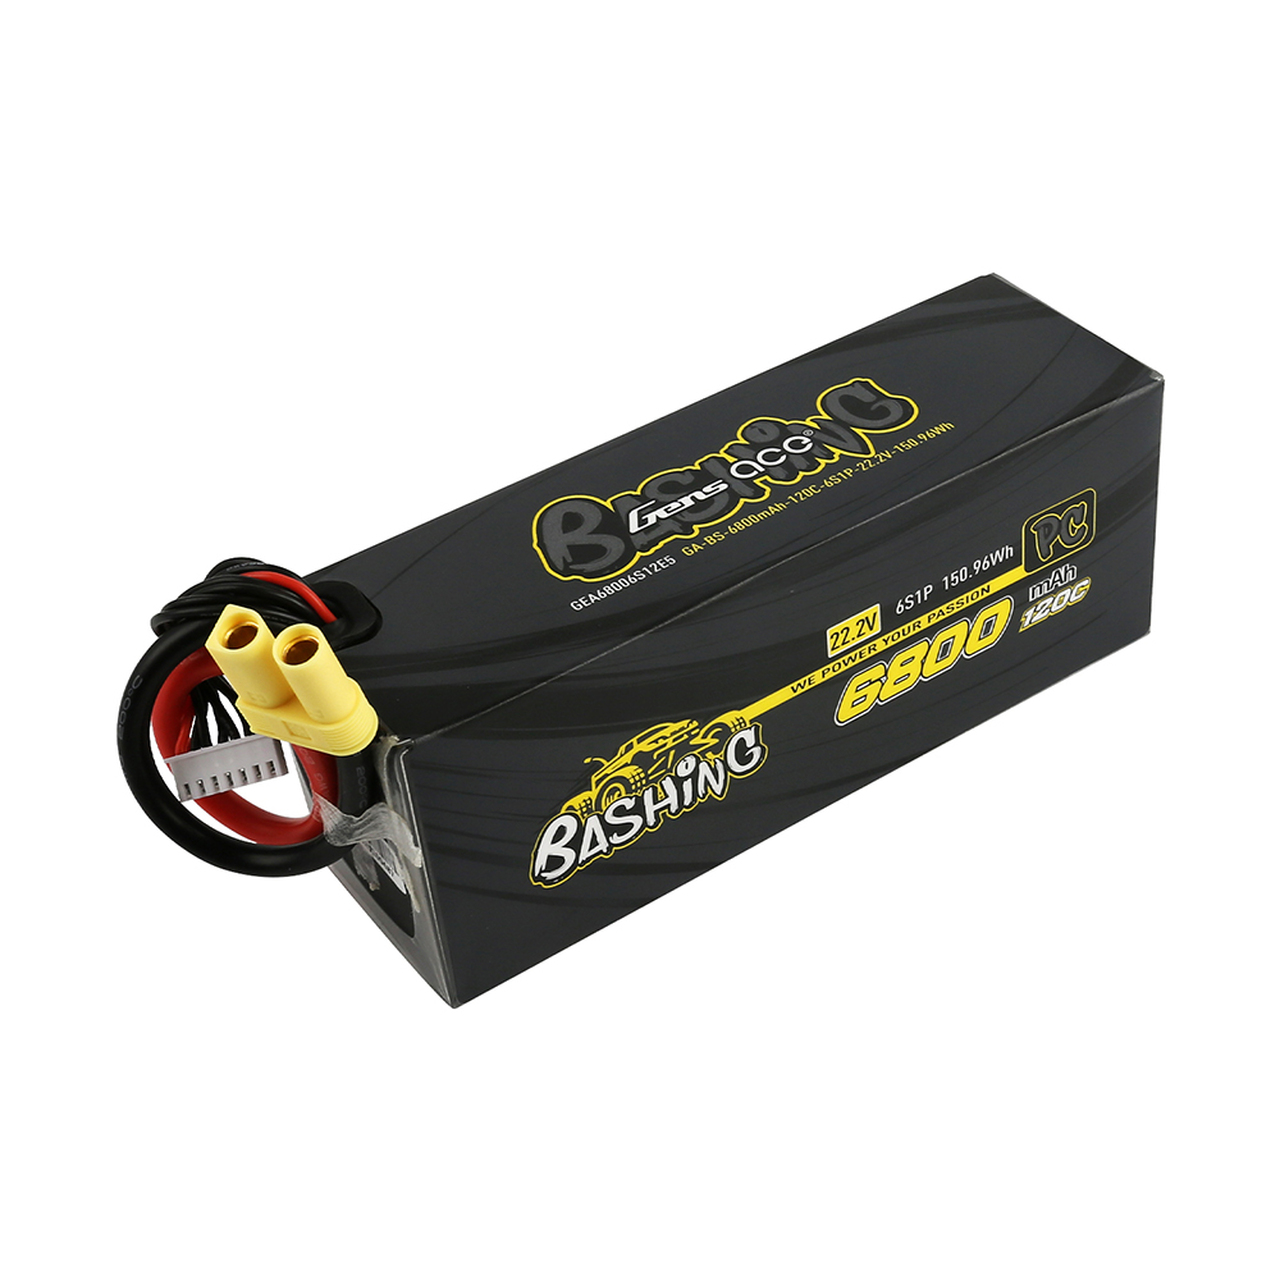 Gens ace Bashing Series 6800mAh 22.2V 120C 6S1P Lipo Battery Pack with EC5 Plug